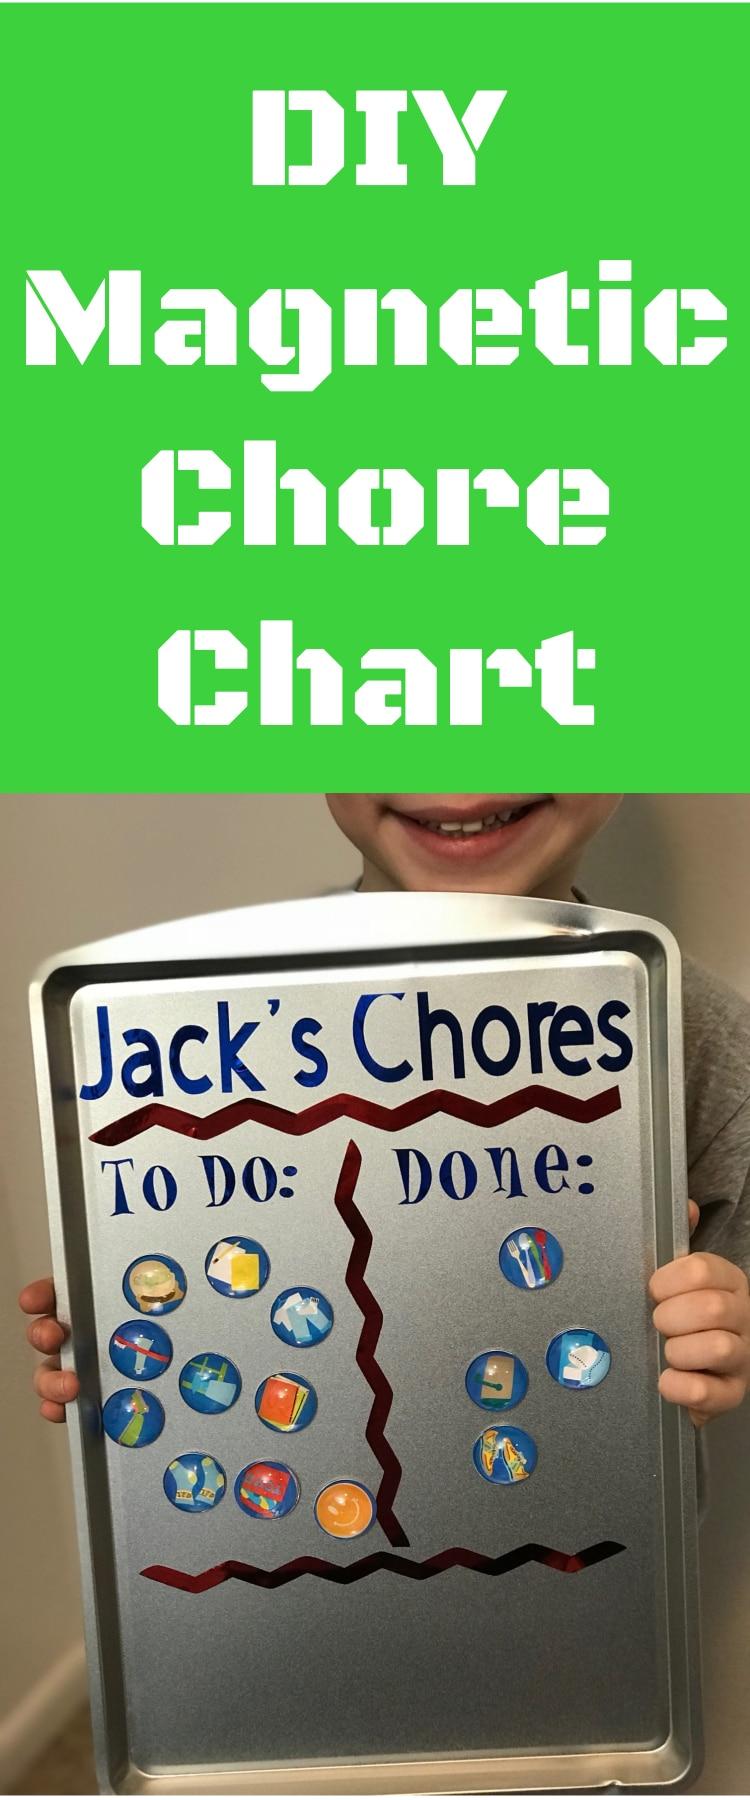 Chore Chart / DIY Chore Chart / Magnet Chore Chart / Cricut Chore Chart / Cricut Crafts #DIY #CricutMaker #CricutExploreAir